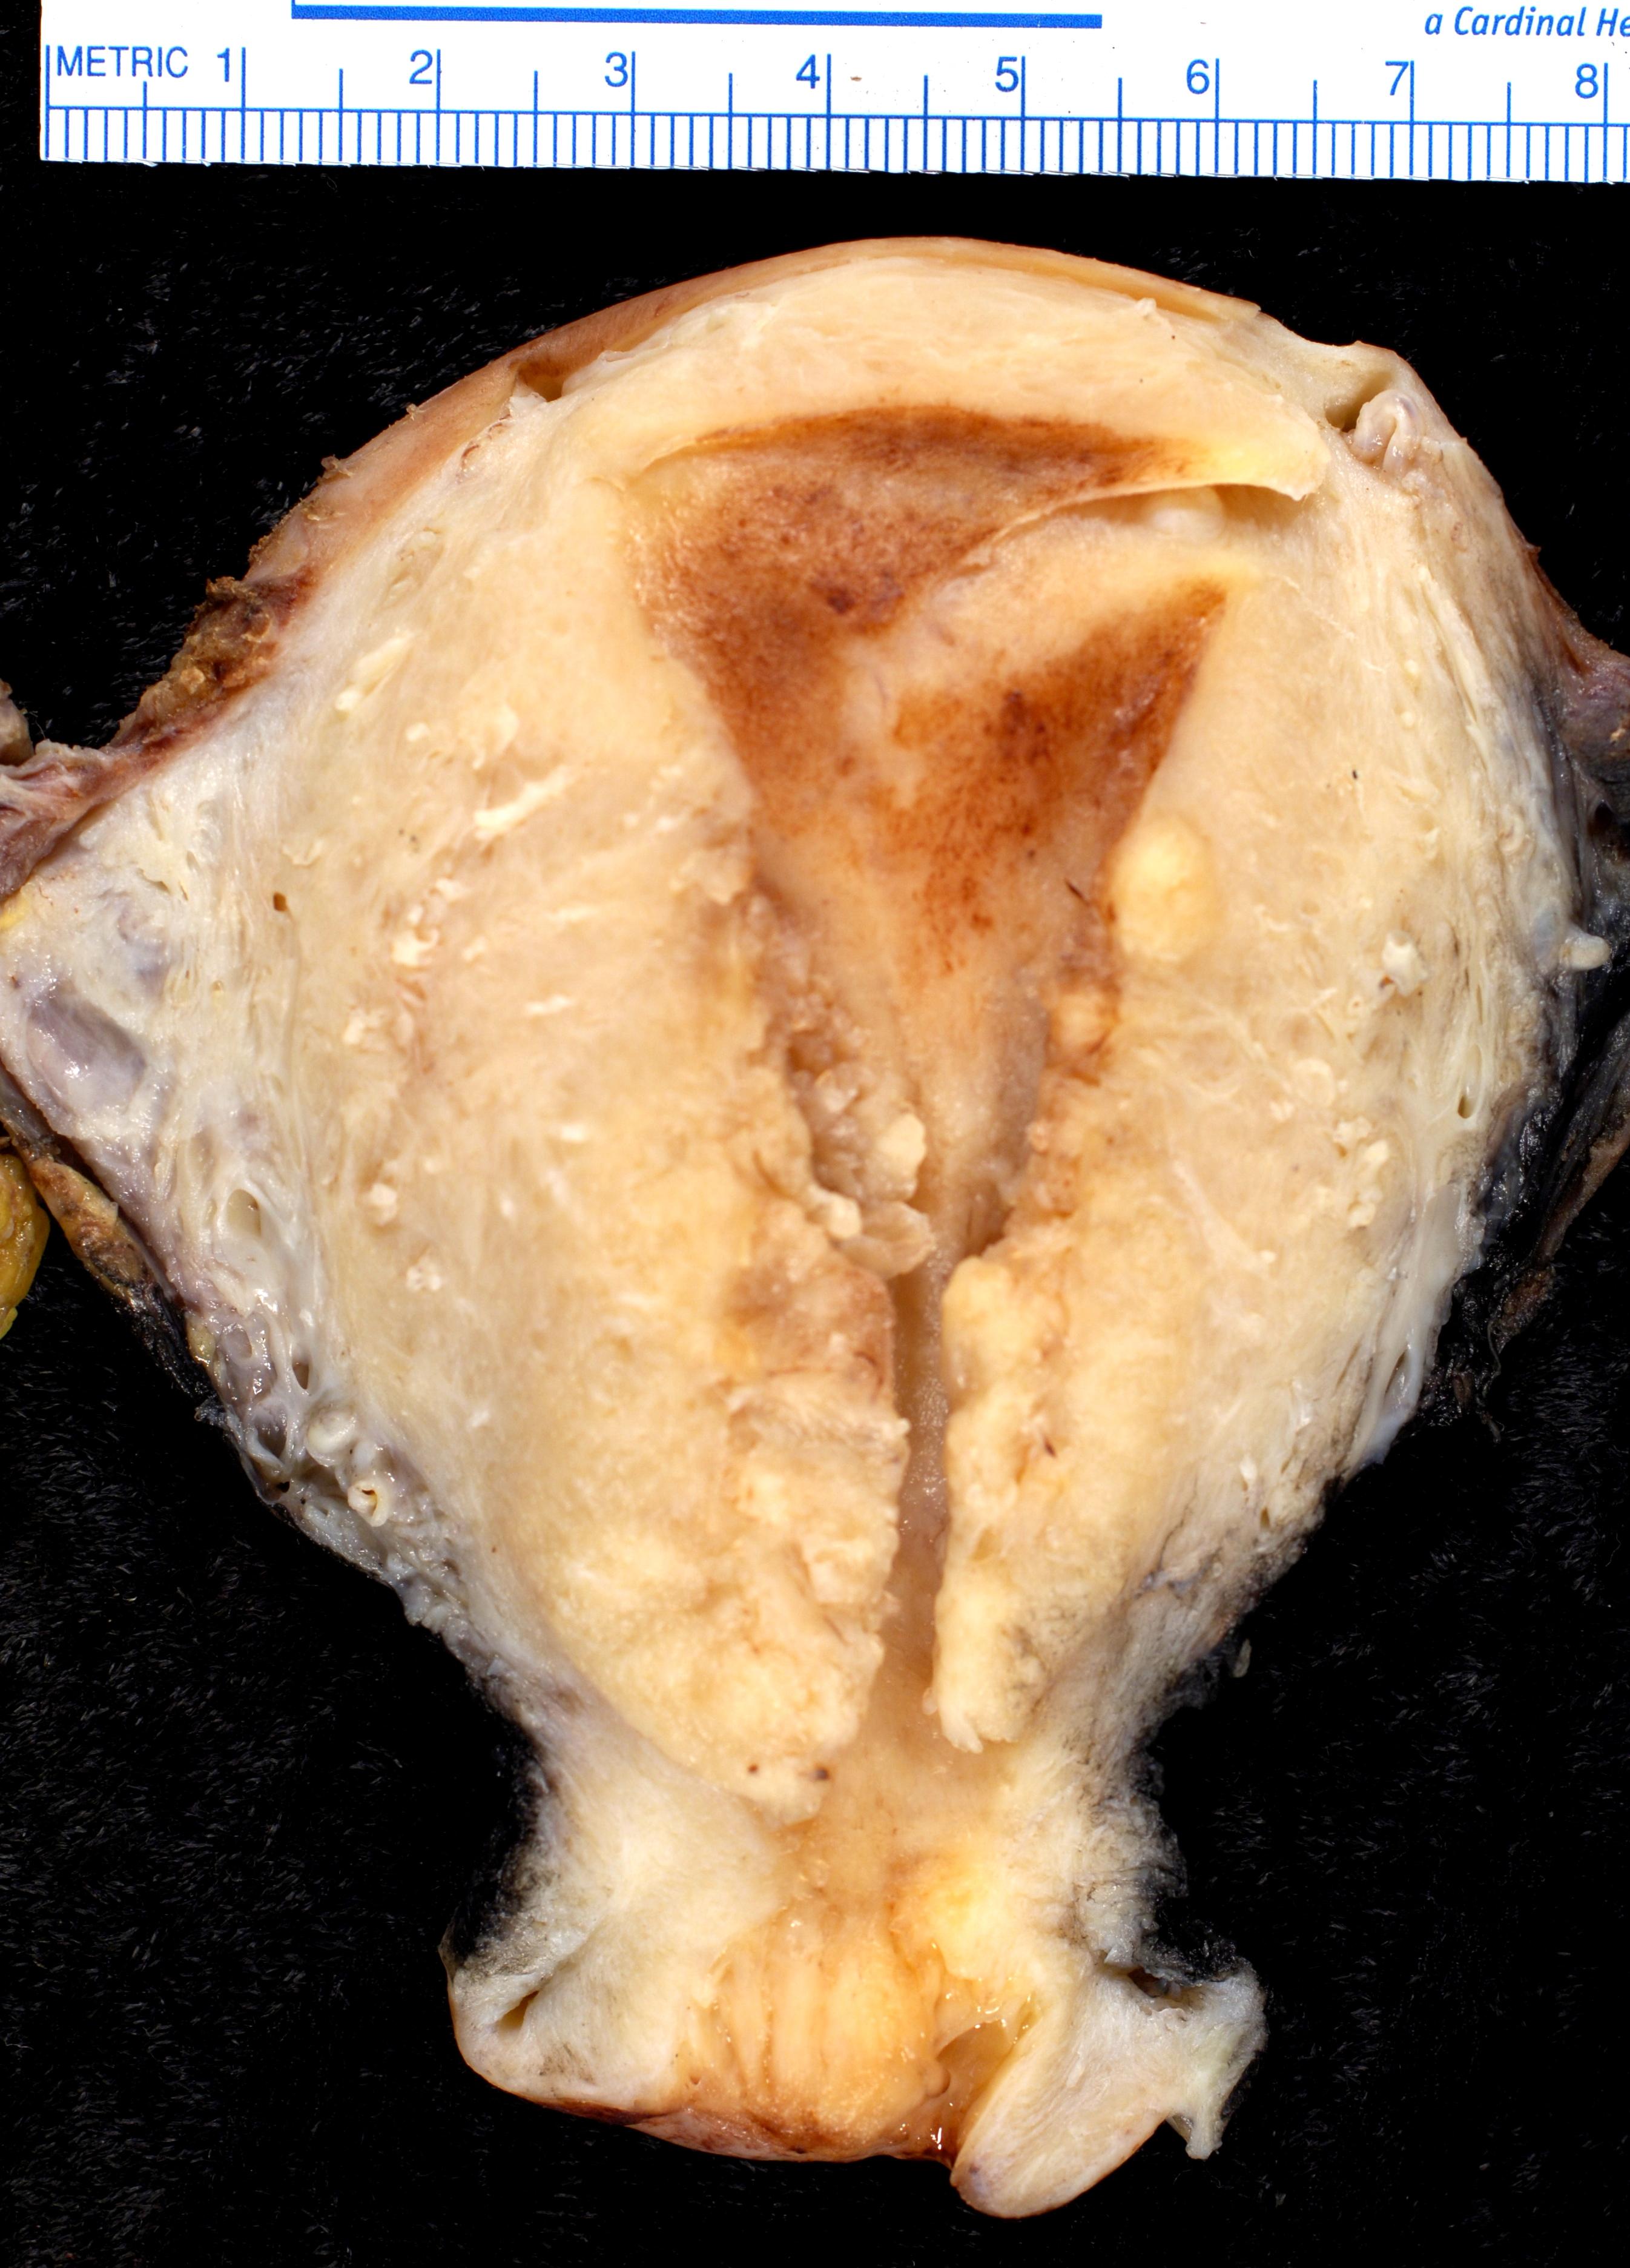 Abdomenul Acut Si Hemoragia in Ginecologie